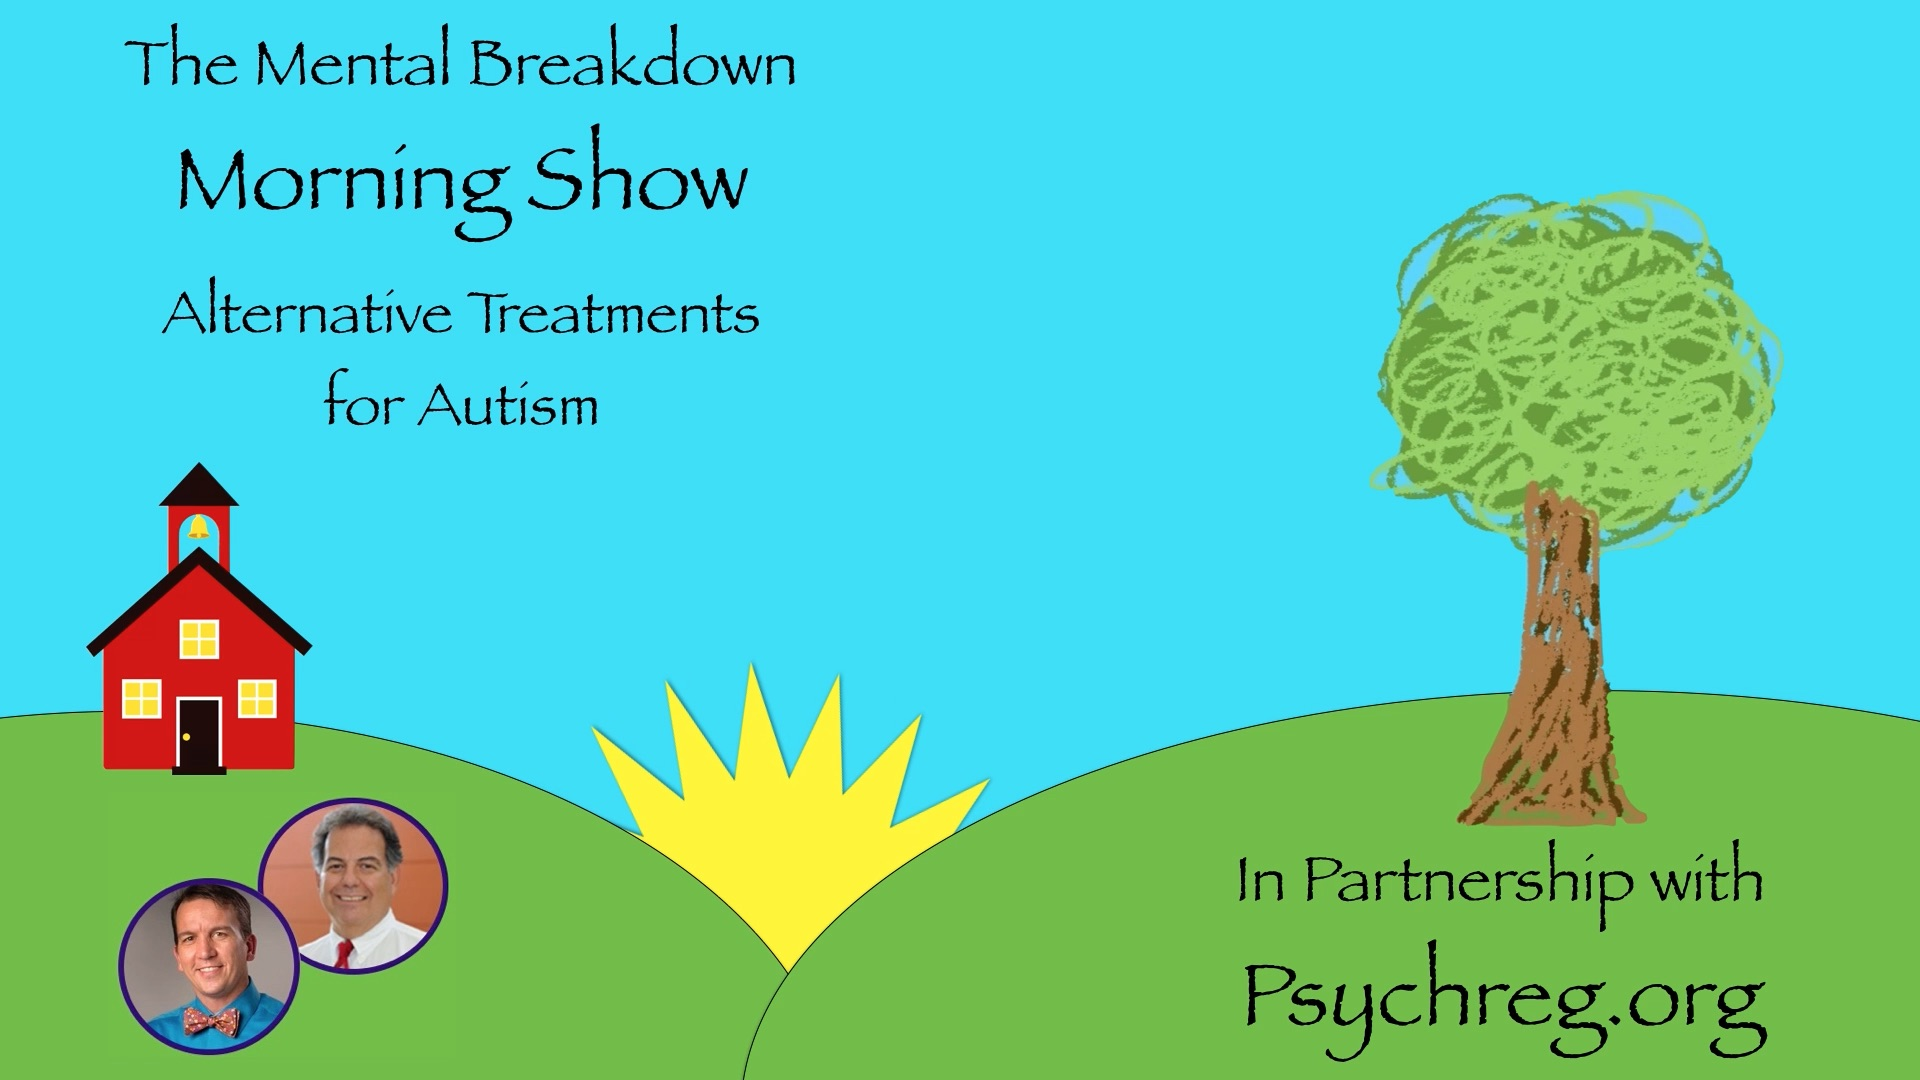 Do Alternative Treatments For Autism >> Alternative Treatments For Autism The Mental Breakdown